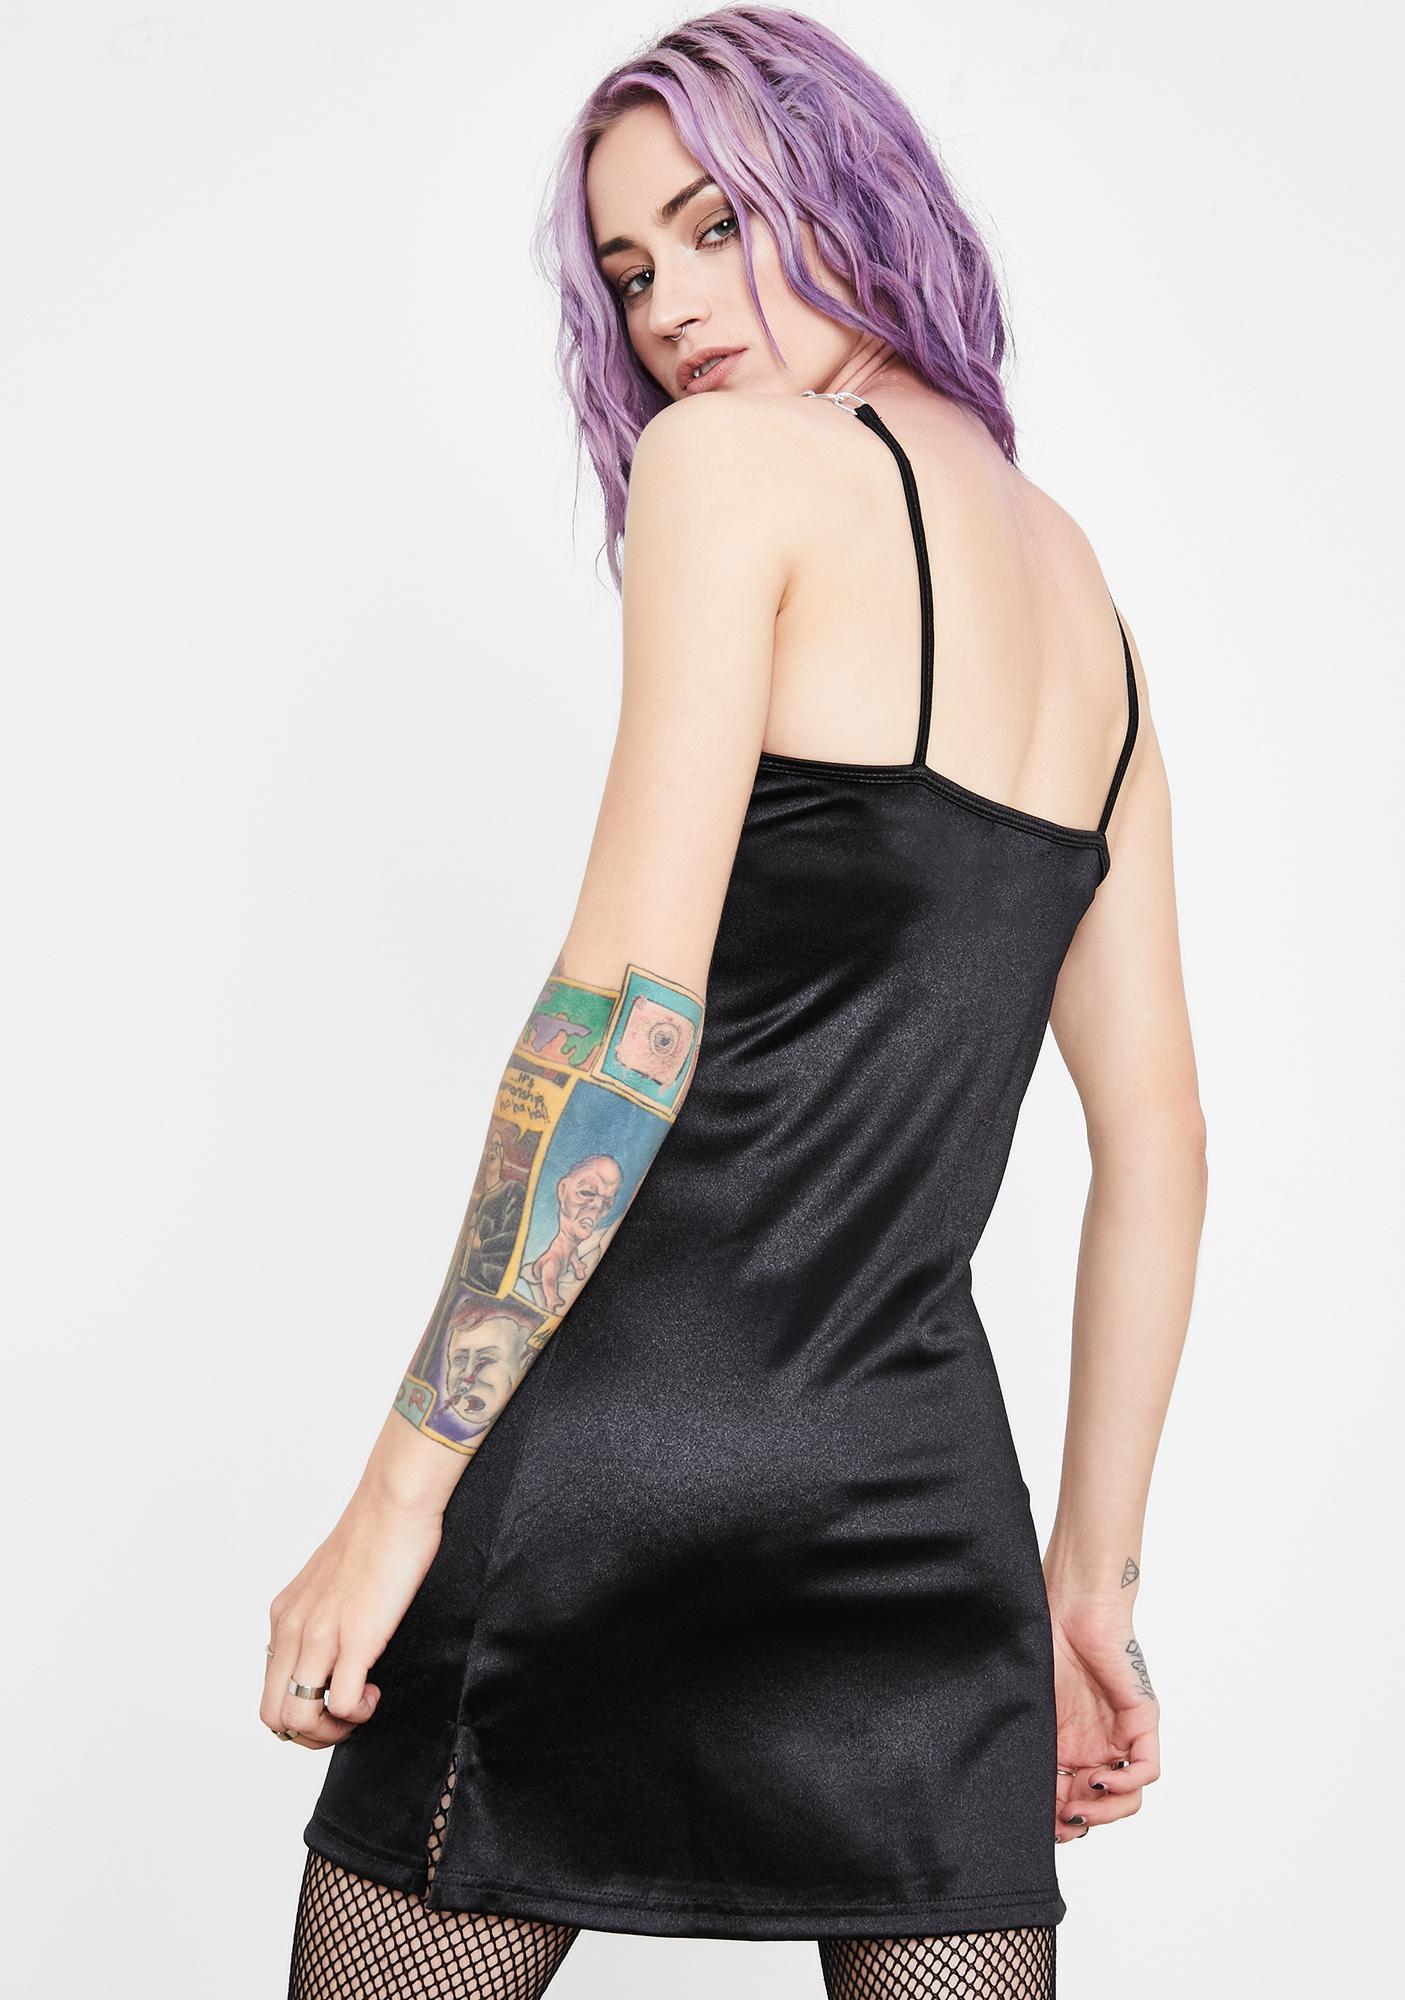 Current Mood Link To My Lust Mini Dress